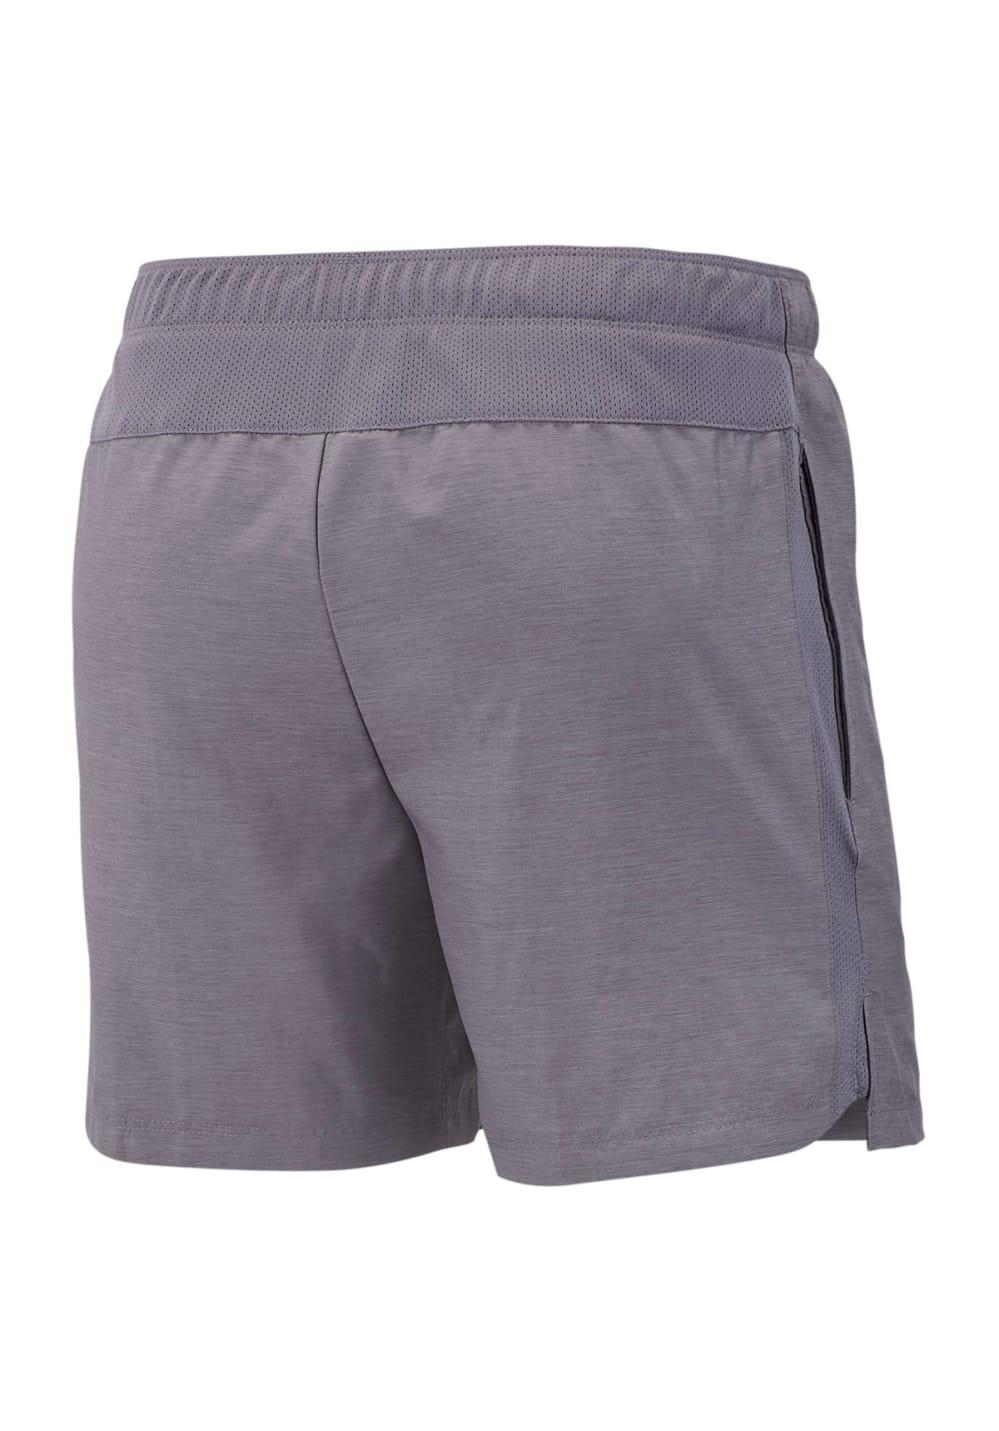 e0331d7997 Nike Challenger Short Bf 5in - Pantalones de running para Hombre ...